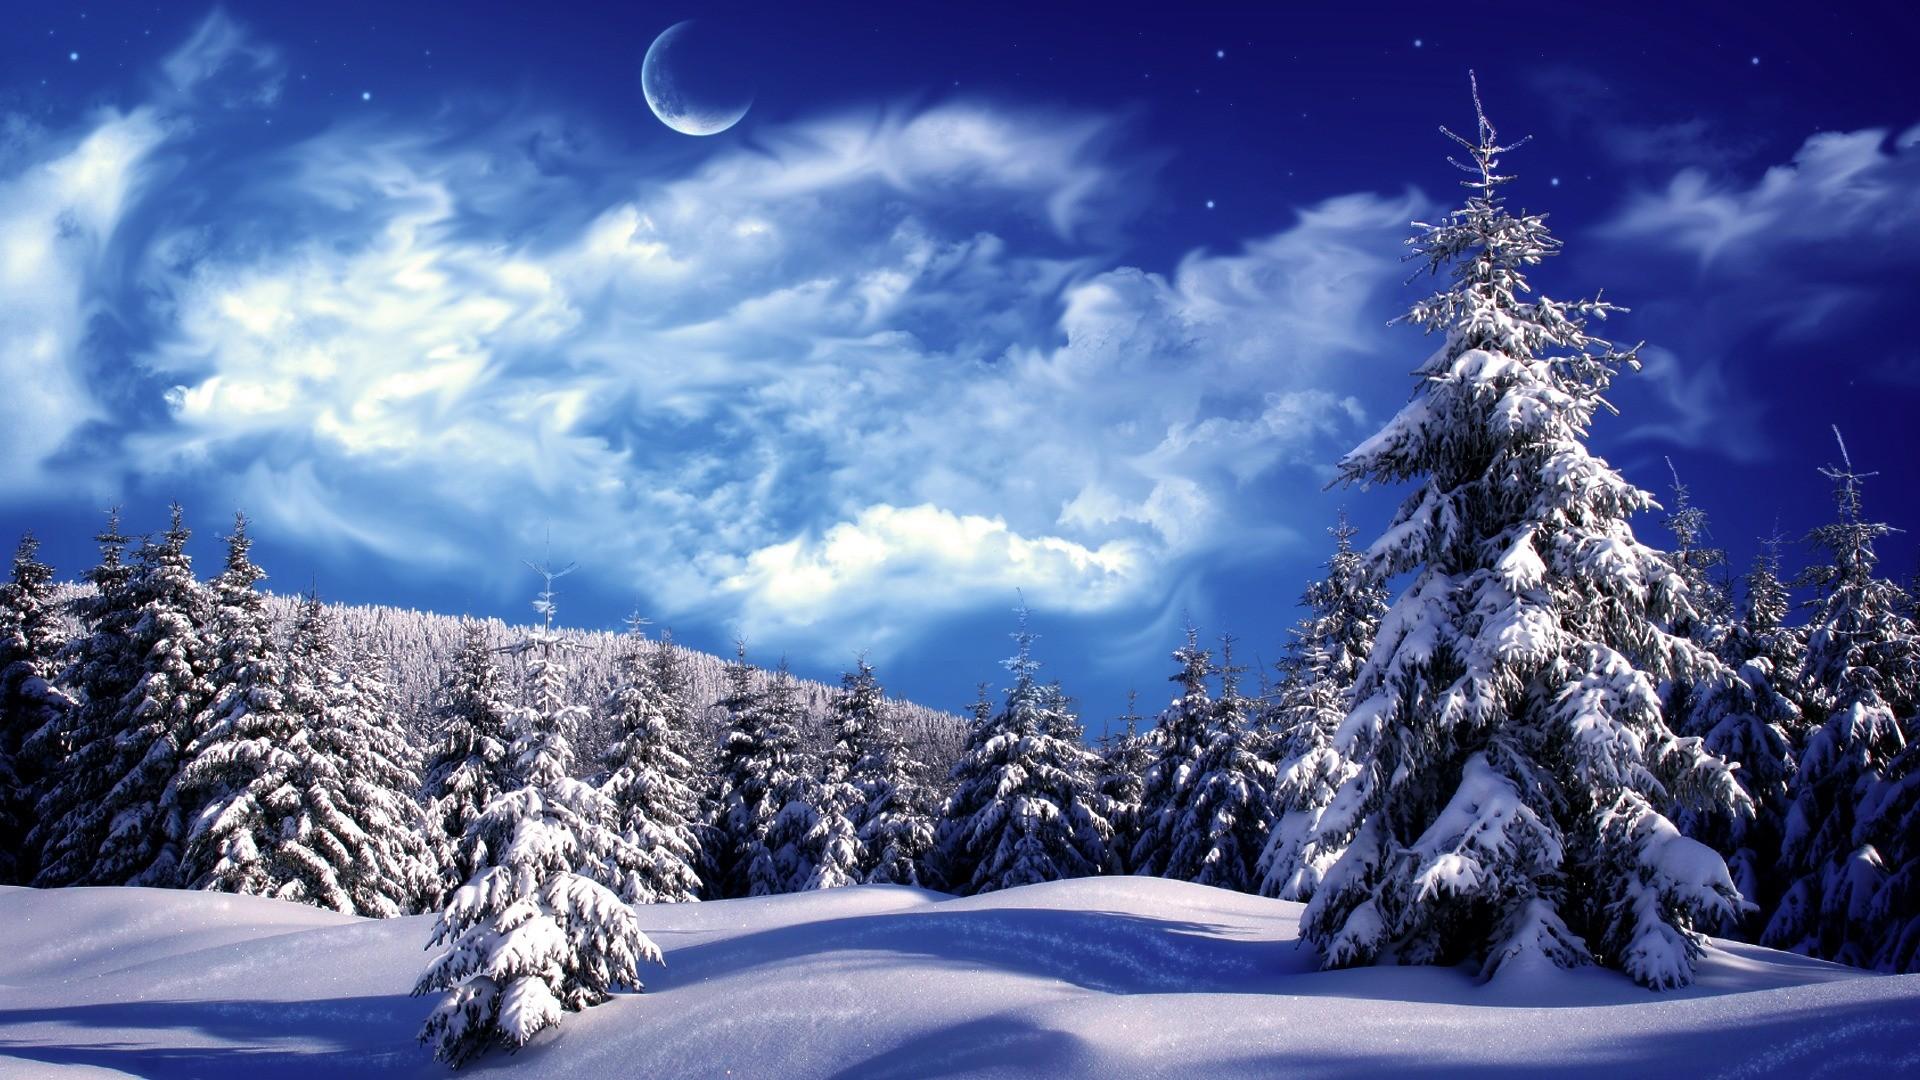 1920x1080 winter background 1920x1080 meizu